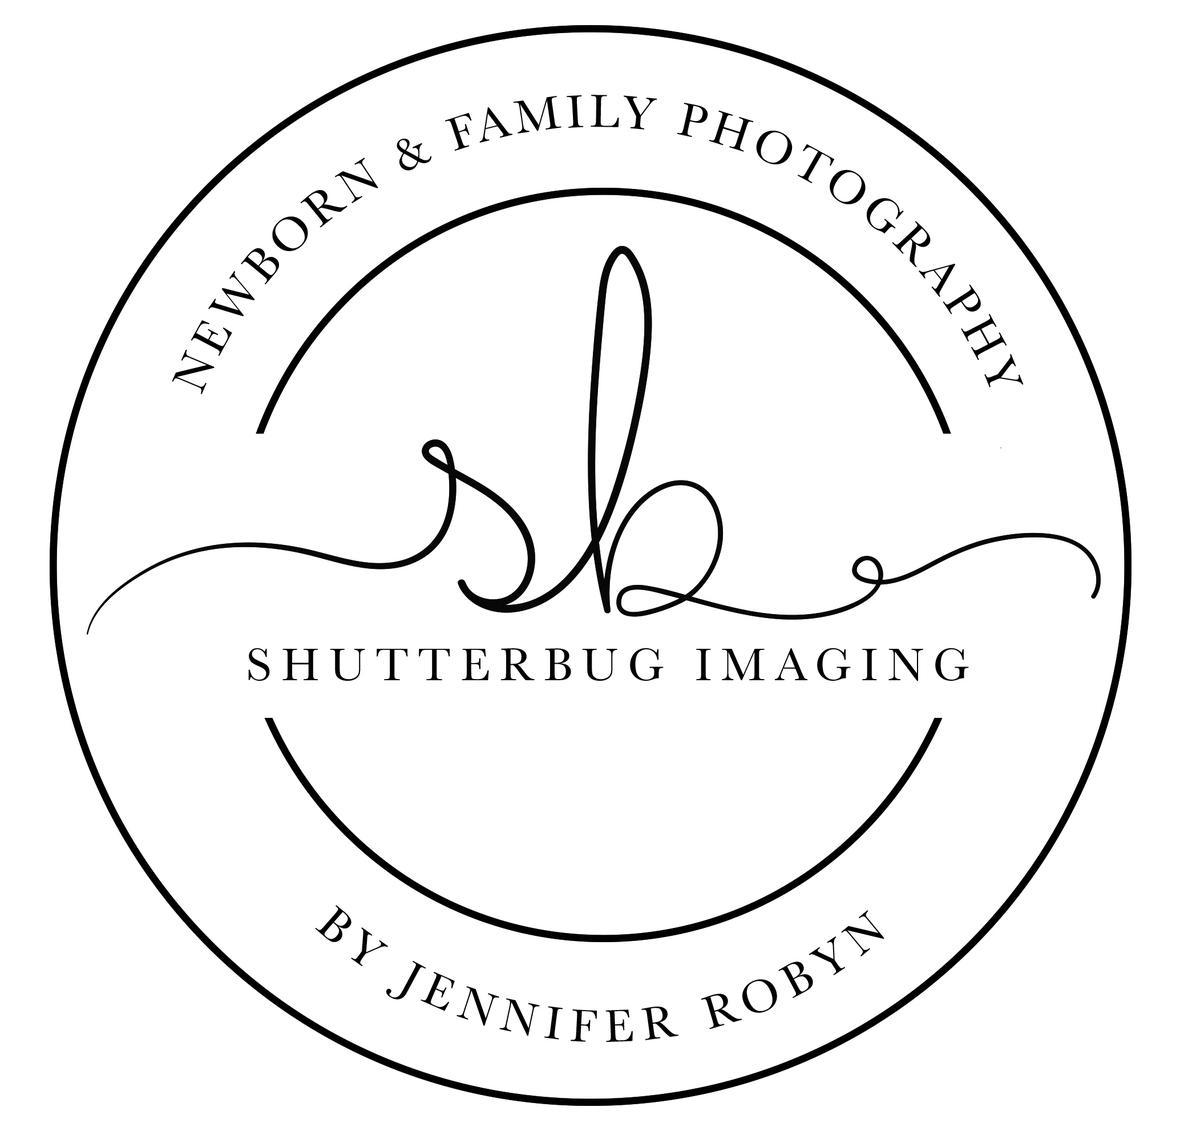 ShutterbugImaging2b